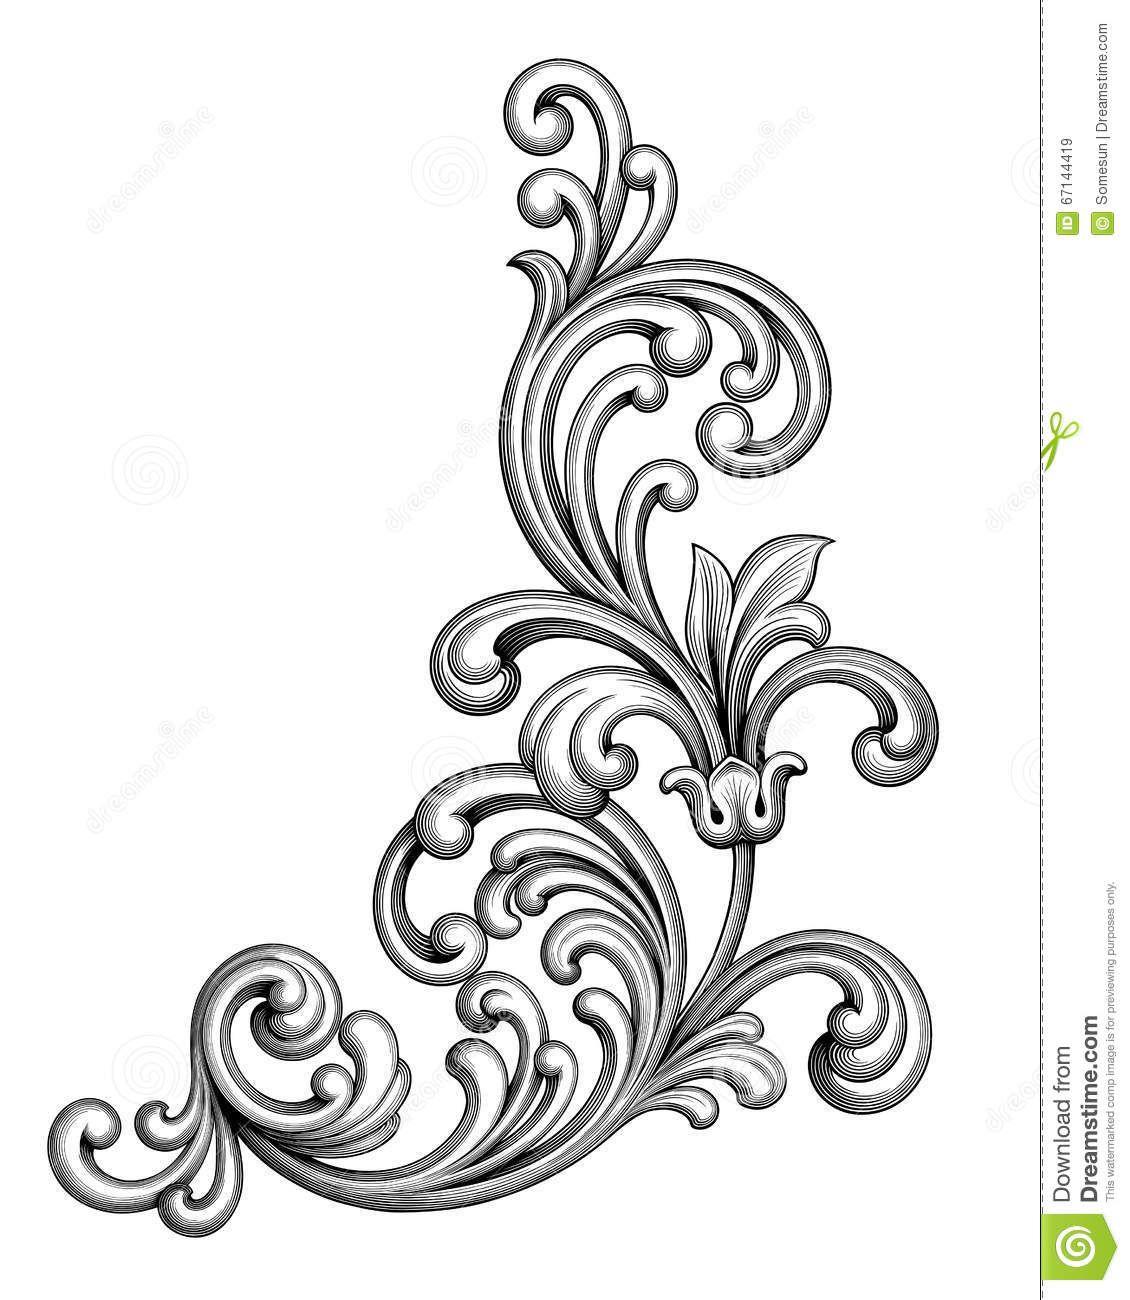 Vintage Baroque Victorian Frame Border Monogram Floral Ornament Scroll Engraved Pattern Tattoo Flower Tattoo Designs Victorian Frame